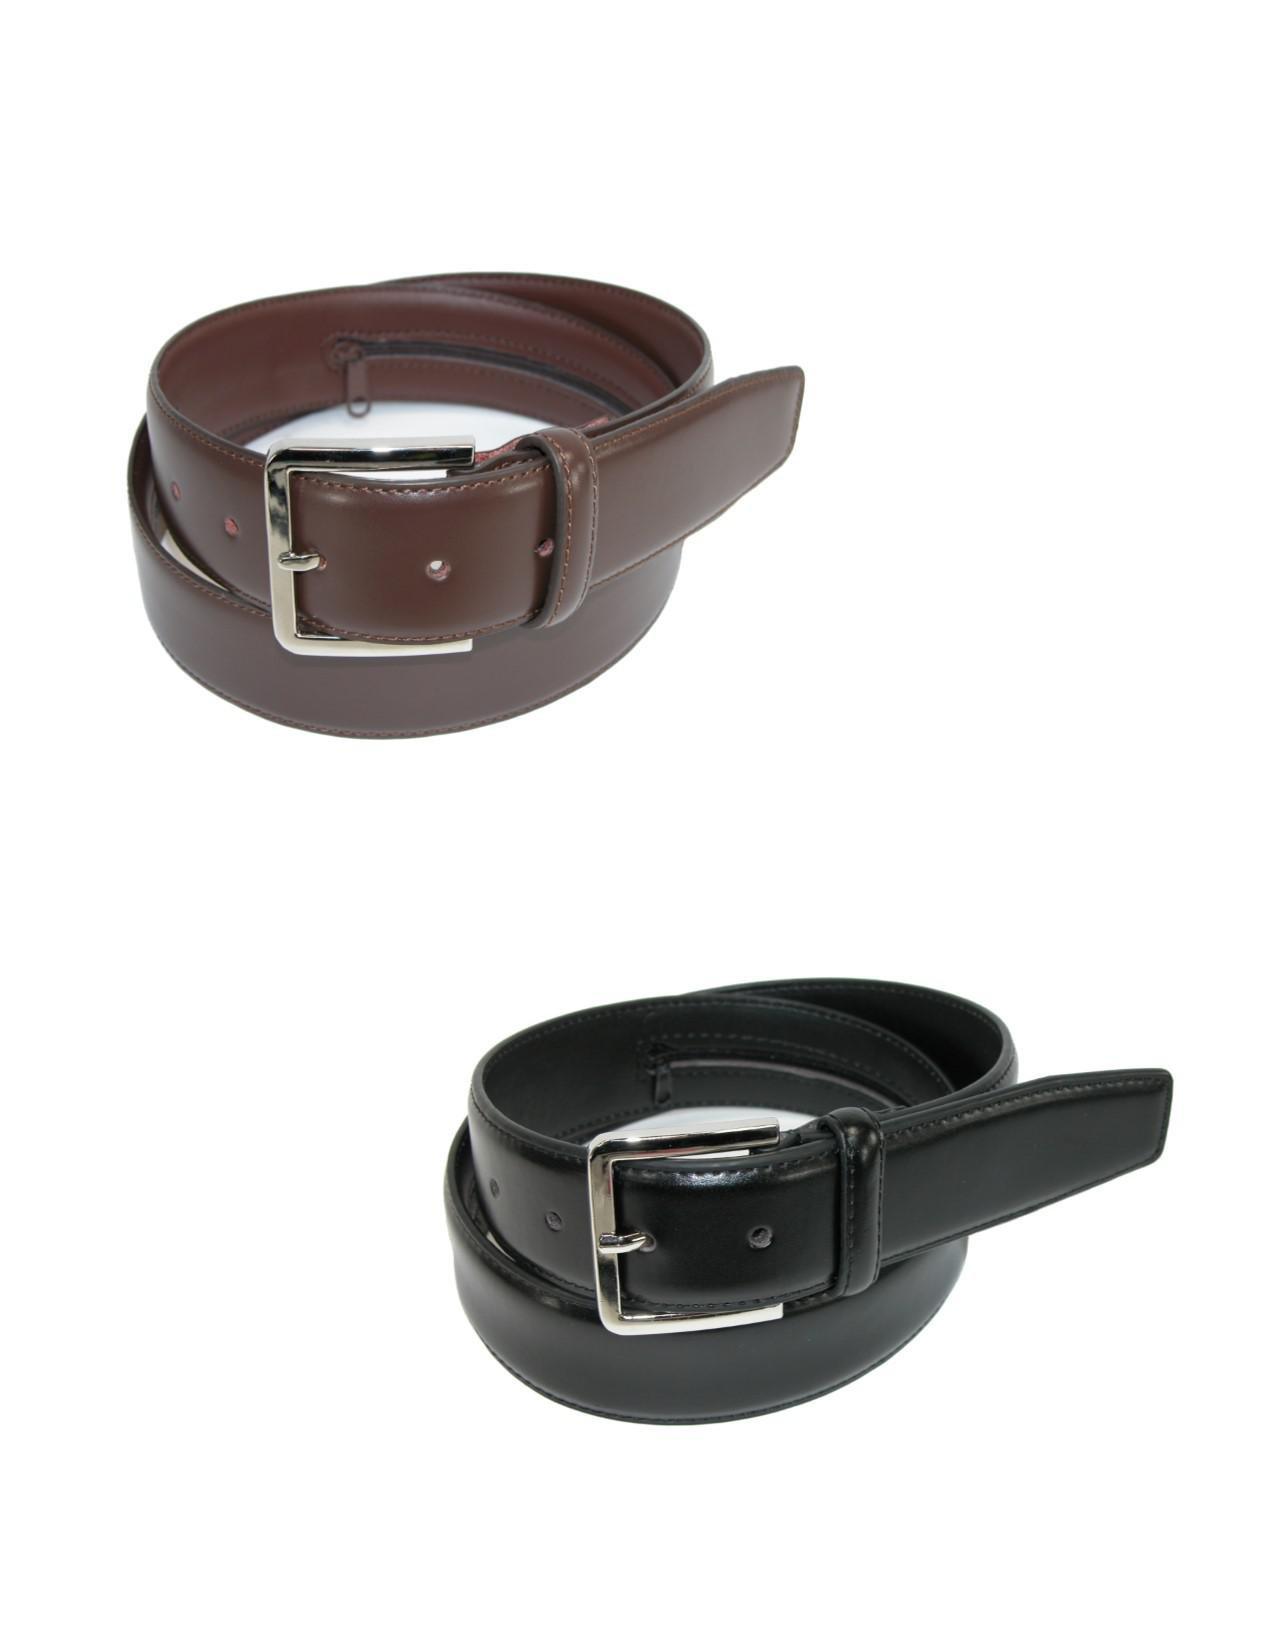 Belton USA Men's Leather Travel Money Belts (Pack of 2), 42, Black/Brown